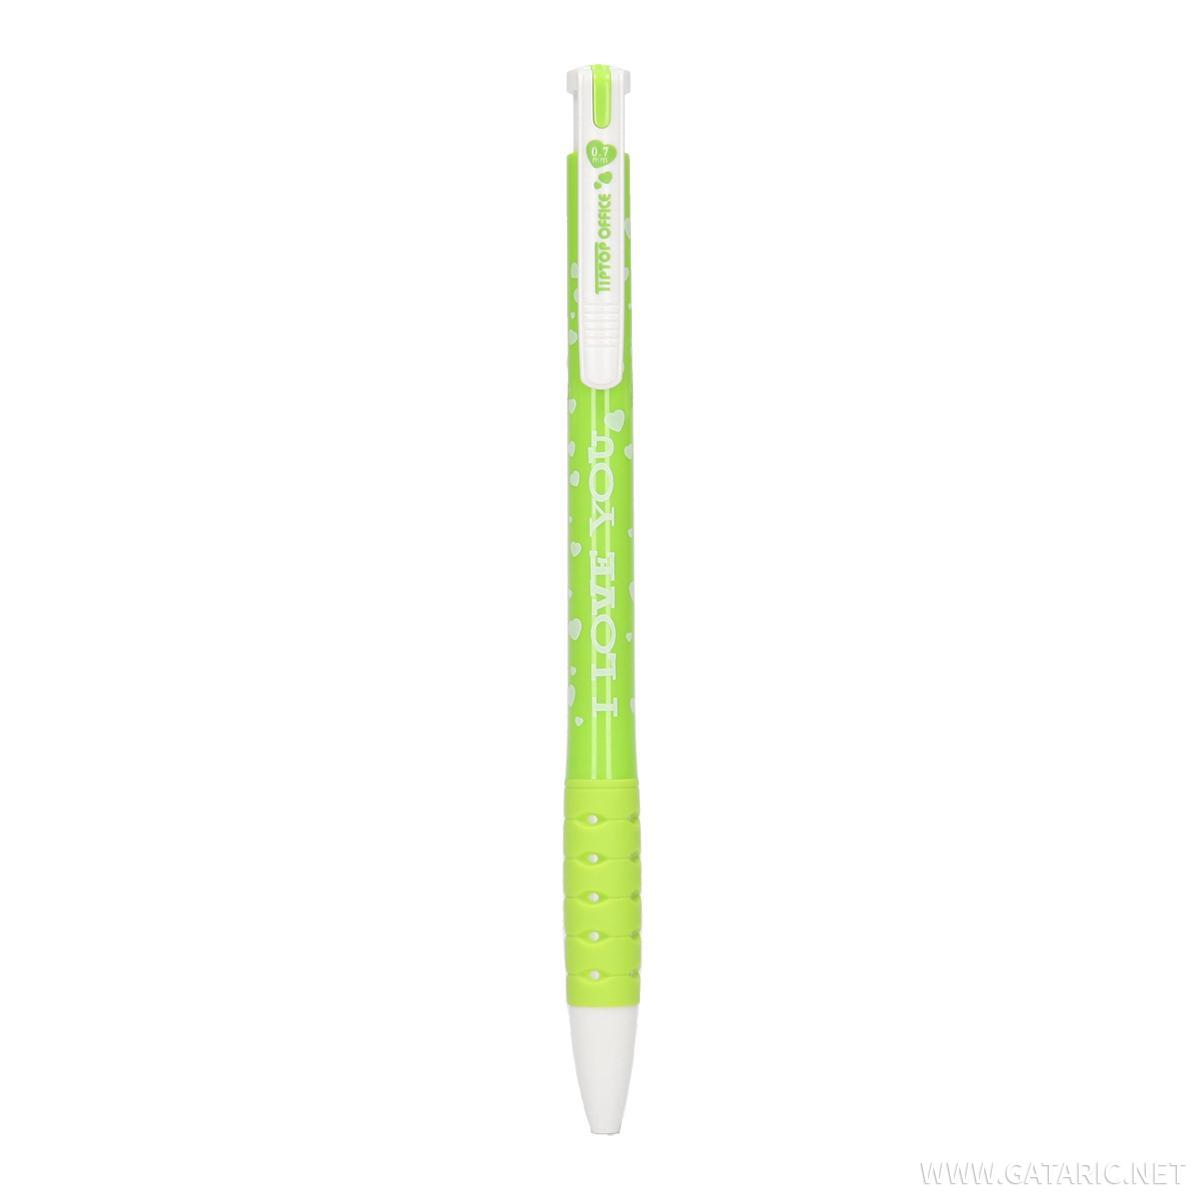 Hemijska olovka  ''I love you'', 0.7mm